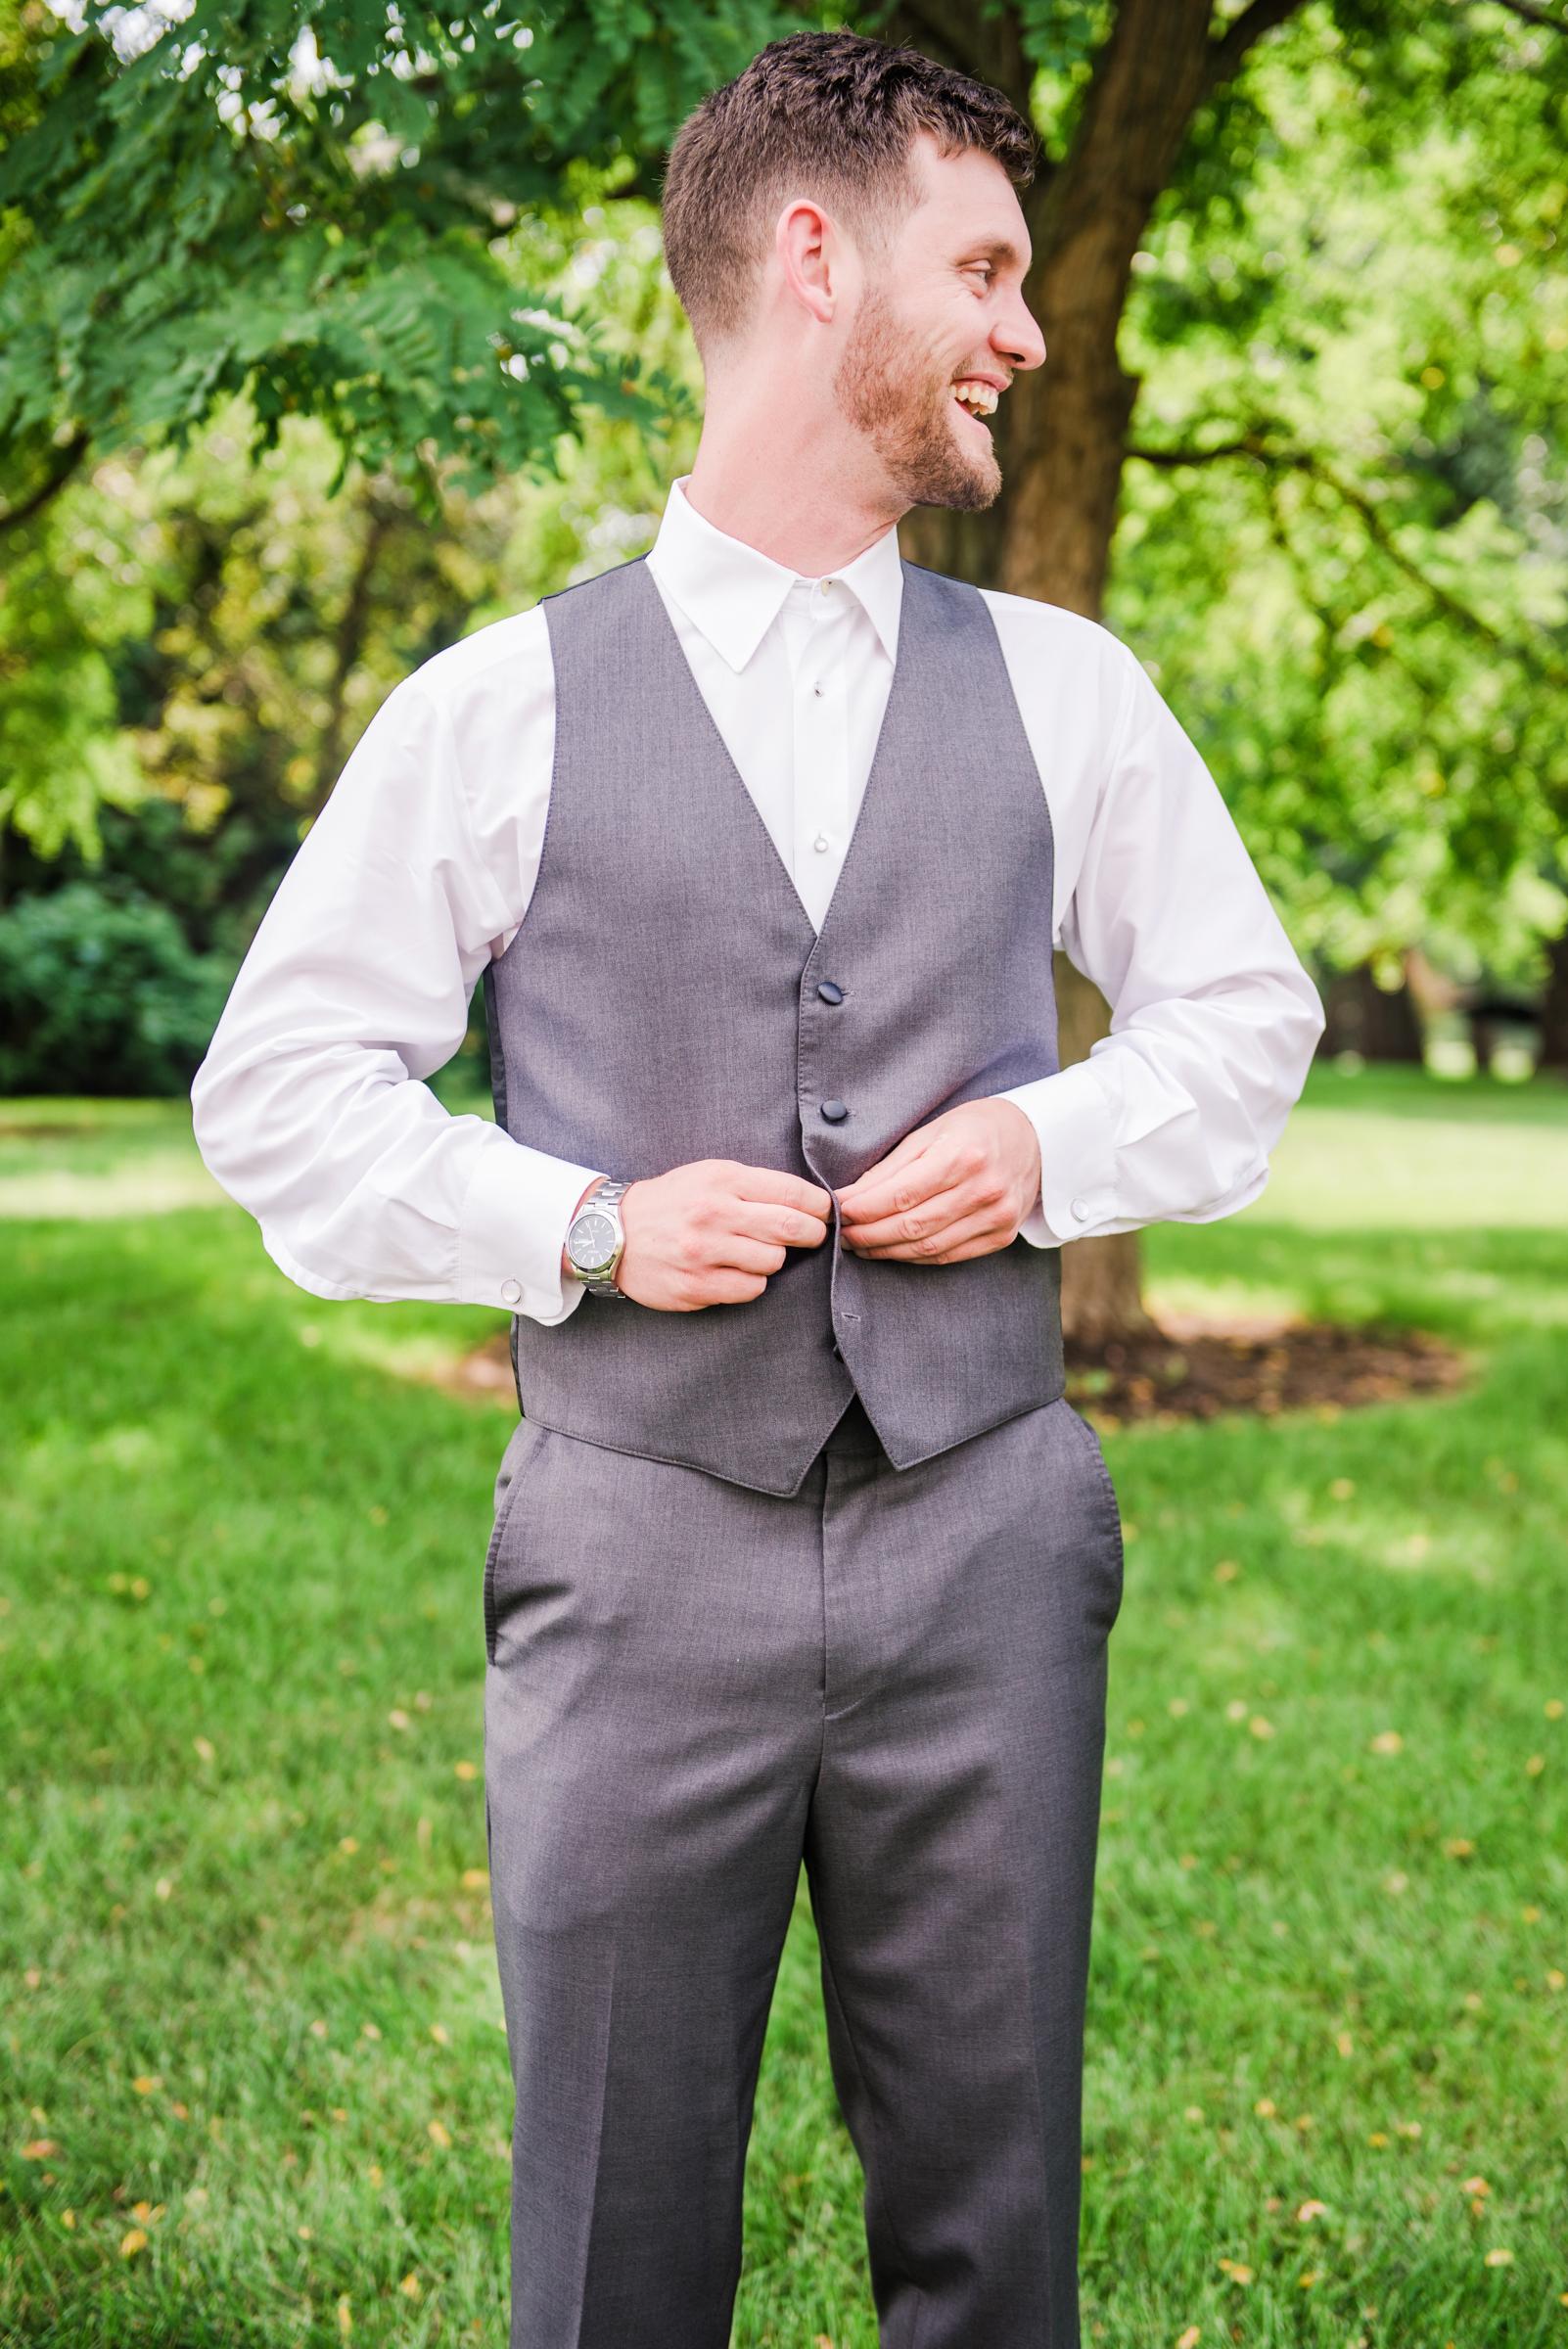 Jerris_Wadsworth_Wedding_Barn_Rochester_Wedding_JILL_STUDIO_Rochester_NY_Photographer_DSC_2220.jpg